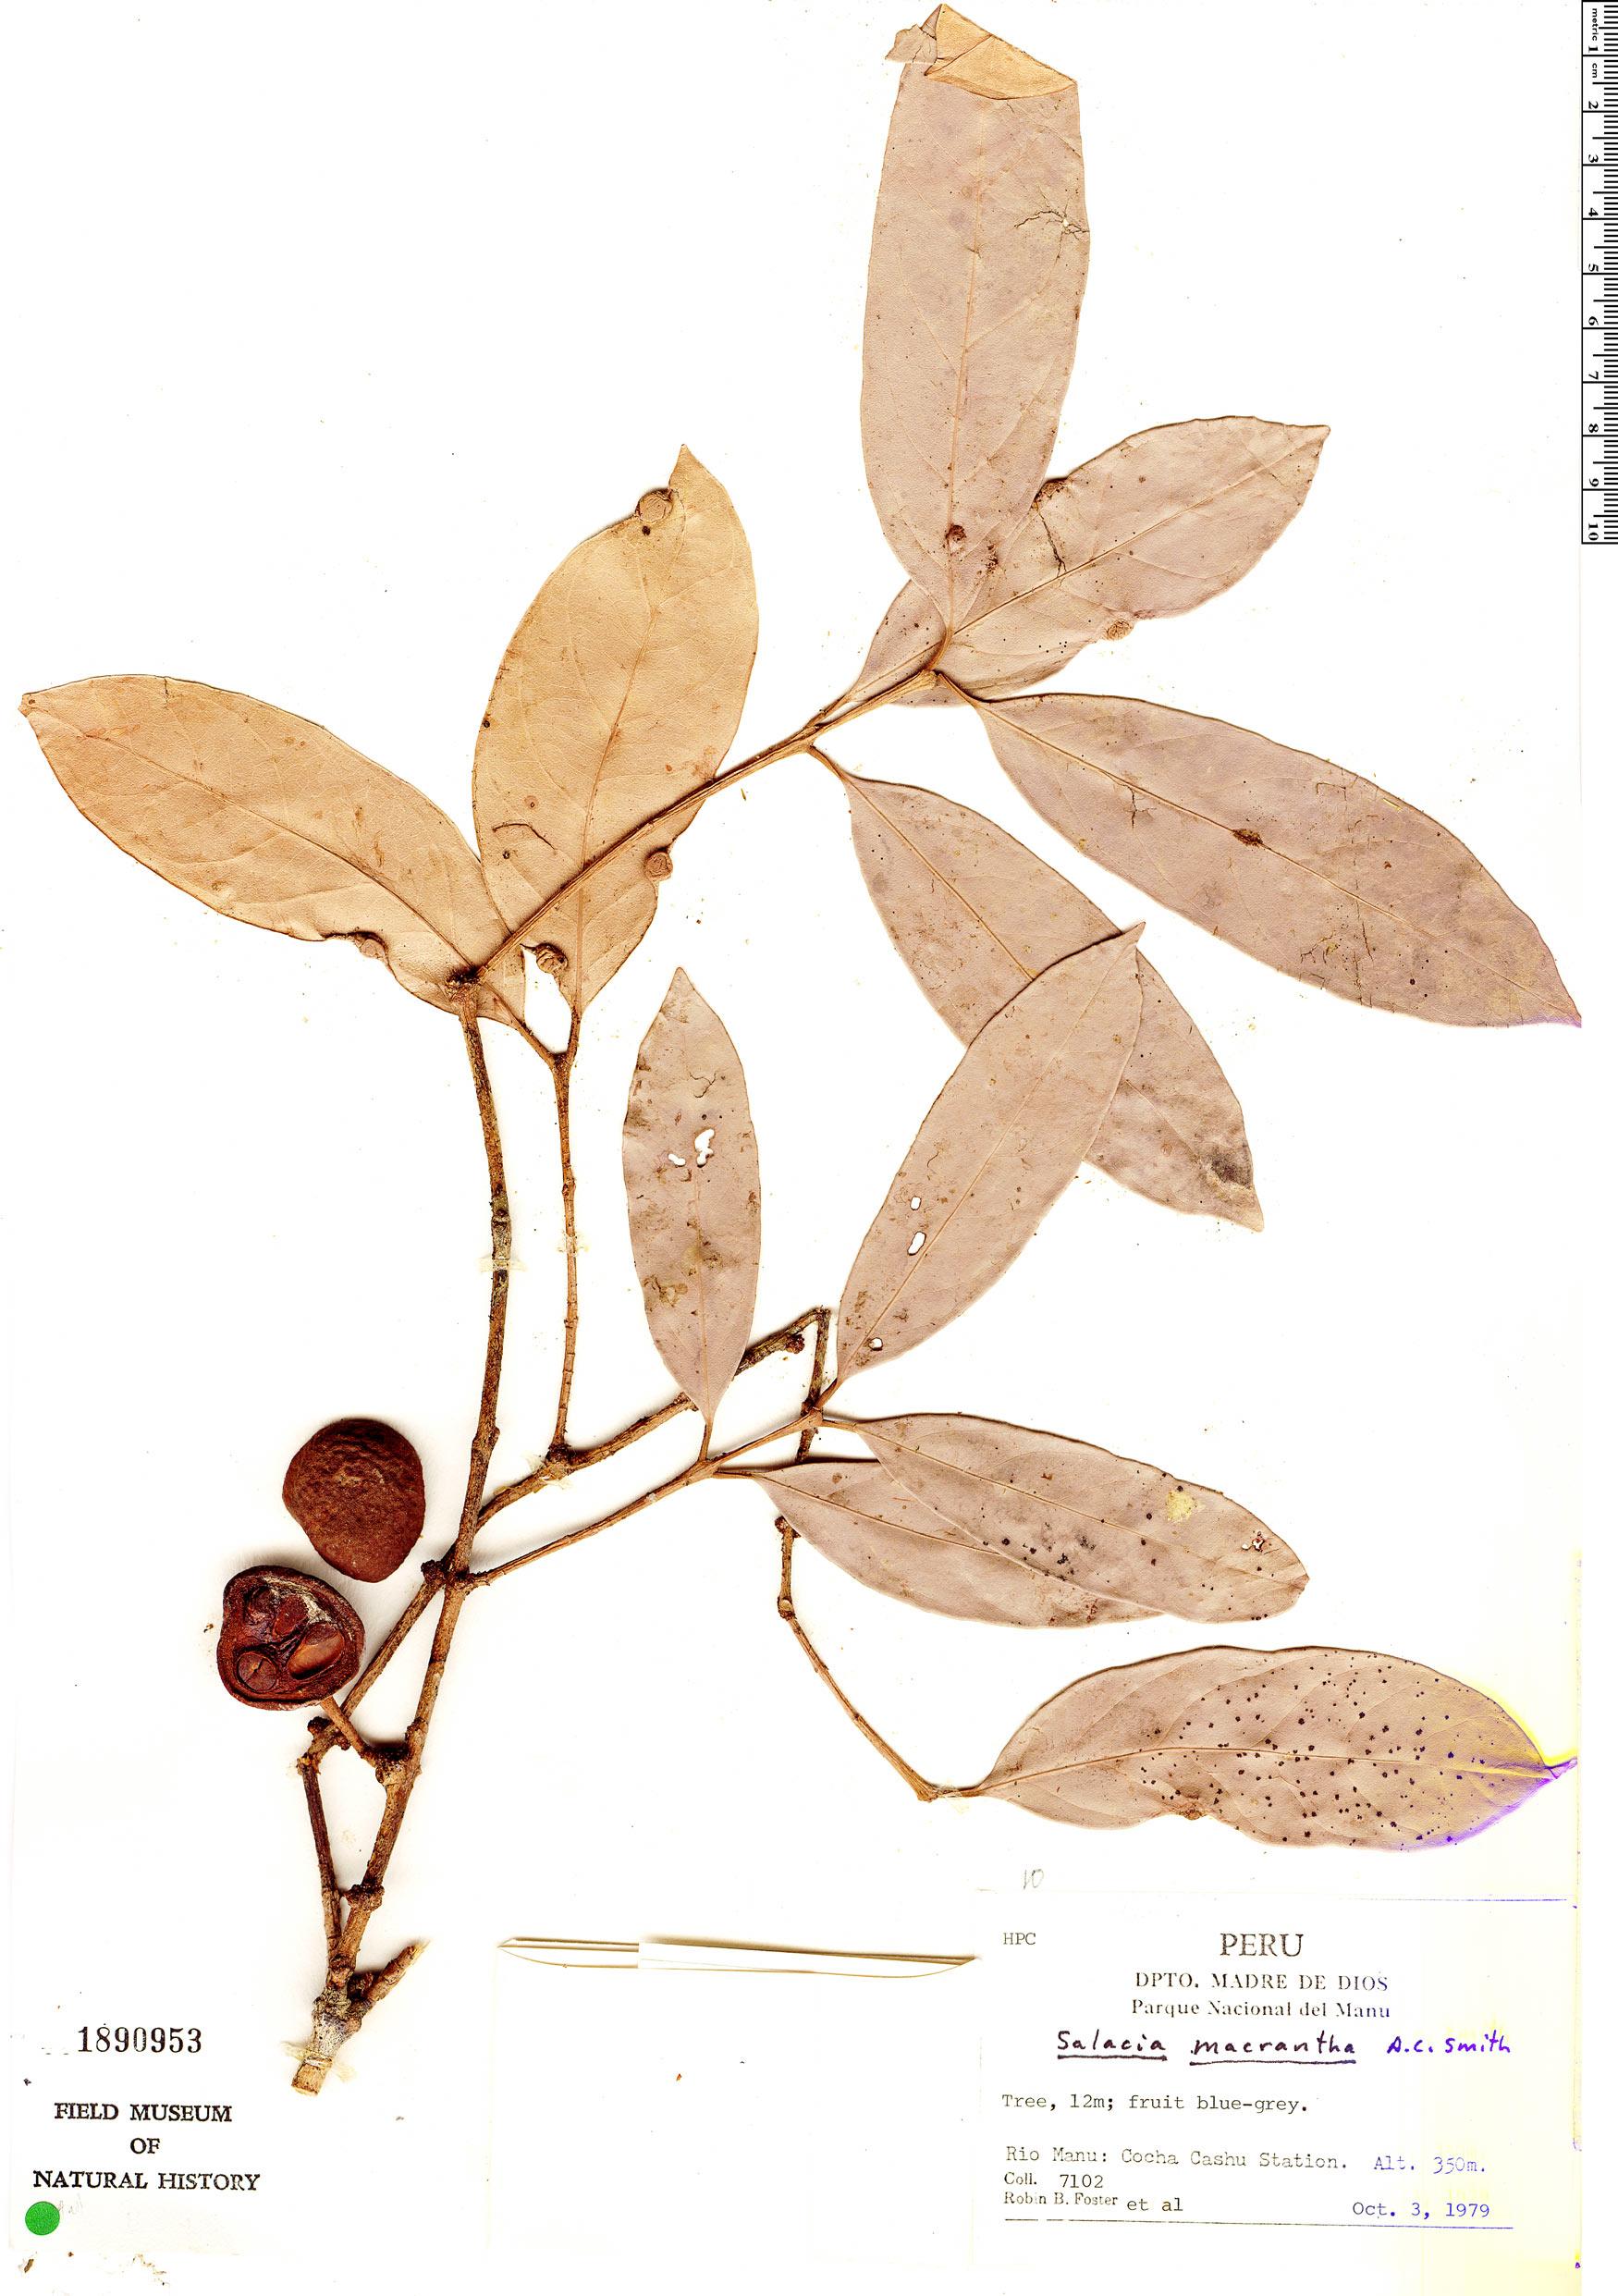 Specimen: Salacia macrantha